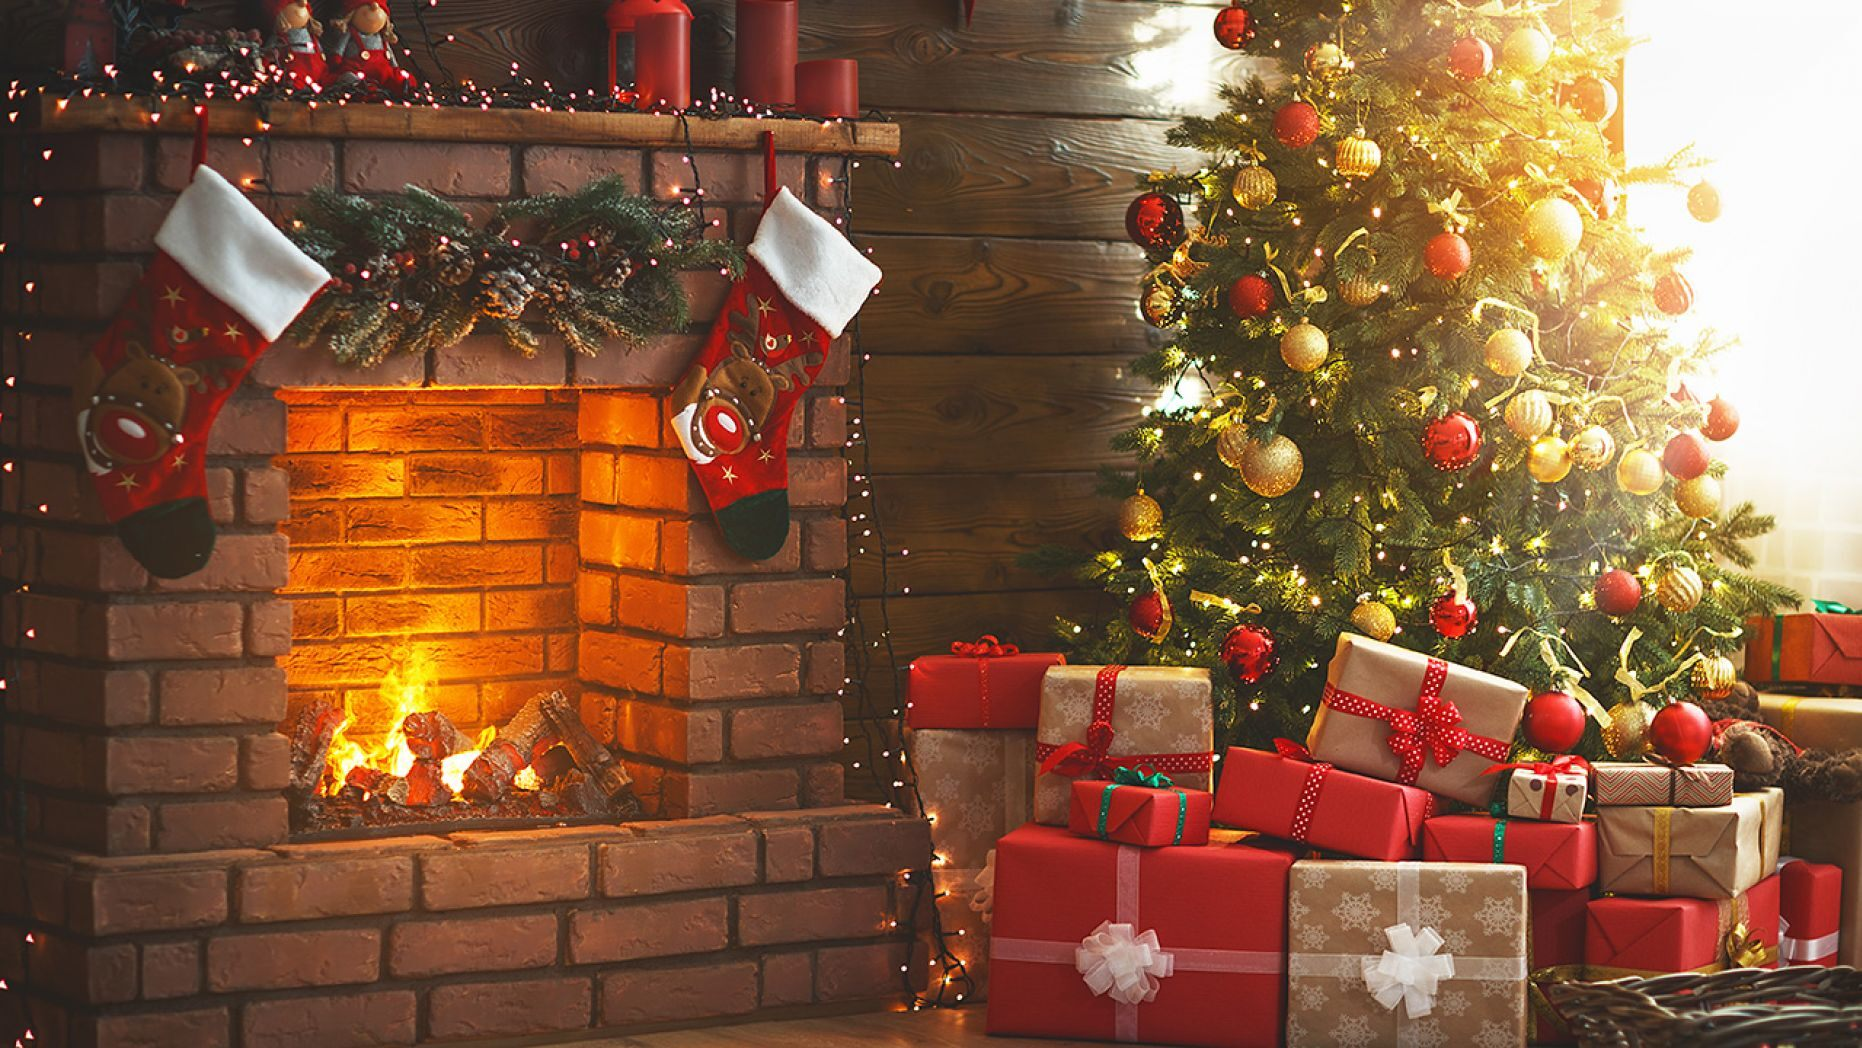 Westlake Legal Group xmas Like Hallmark Christmas movies? Tech company offering $1,000 for binge-watch gig fox-news/lifestyle/occasions/christmas fox-news/entertainment fox news fnc/entertainment fnc dd34cbca-a6b6-518a-bf72-ac6dddcaf199 Brie Stimson article